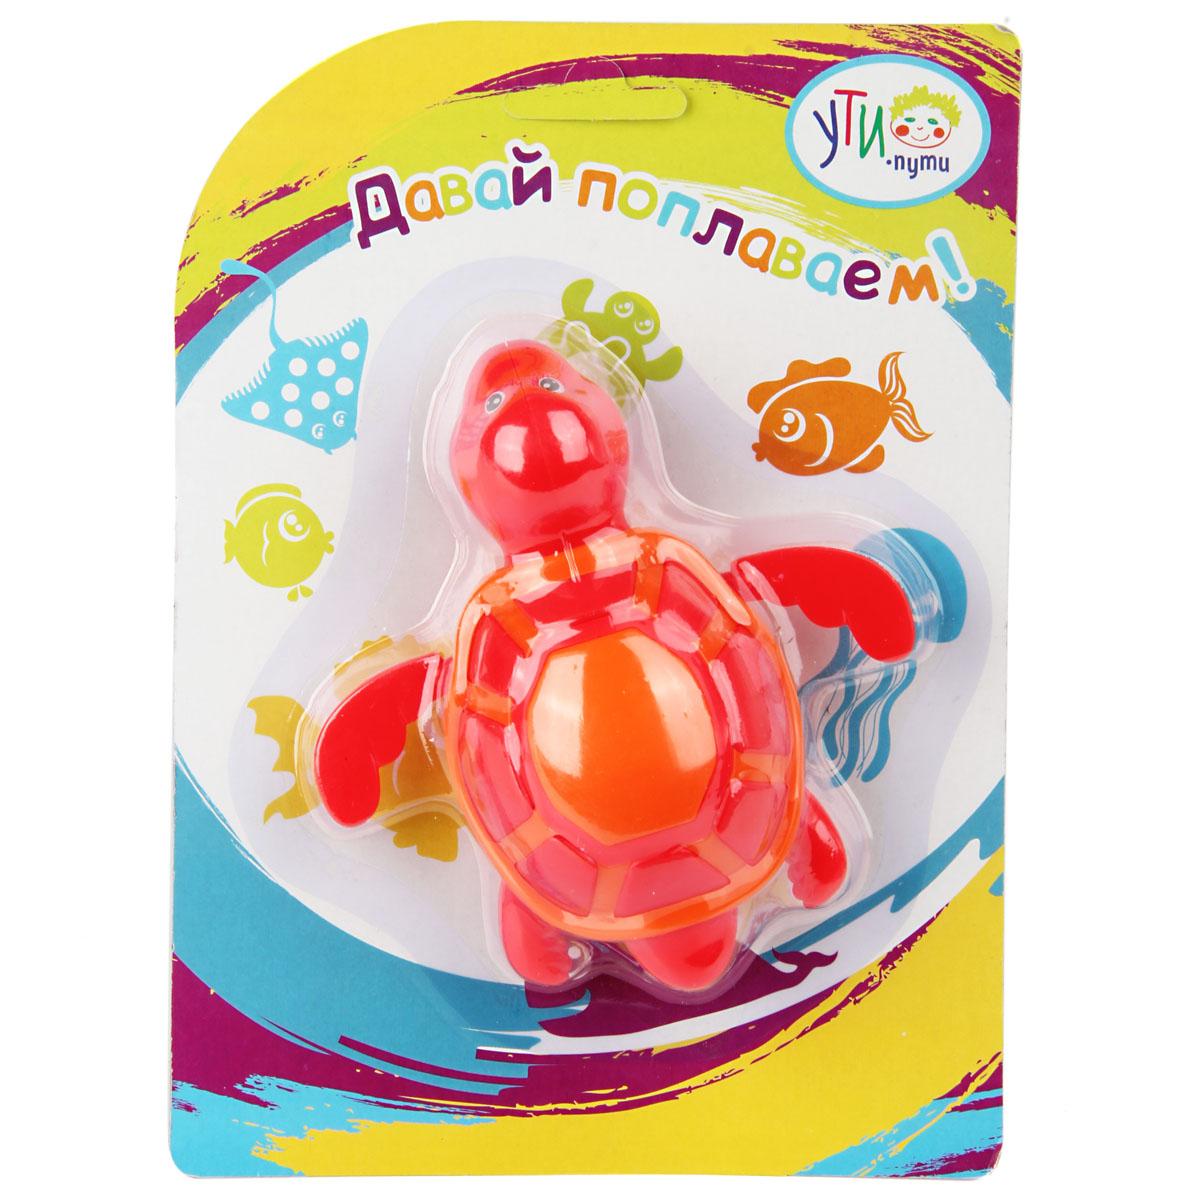 Игрушка для ванны Ути Пути Черепашка развивающий коврик ути пути цветущий сад